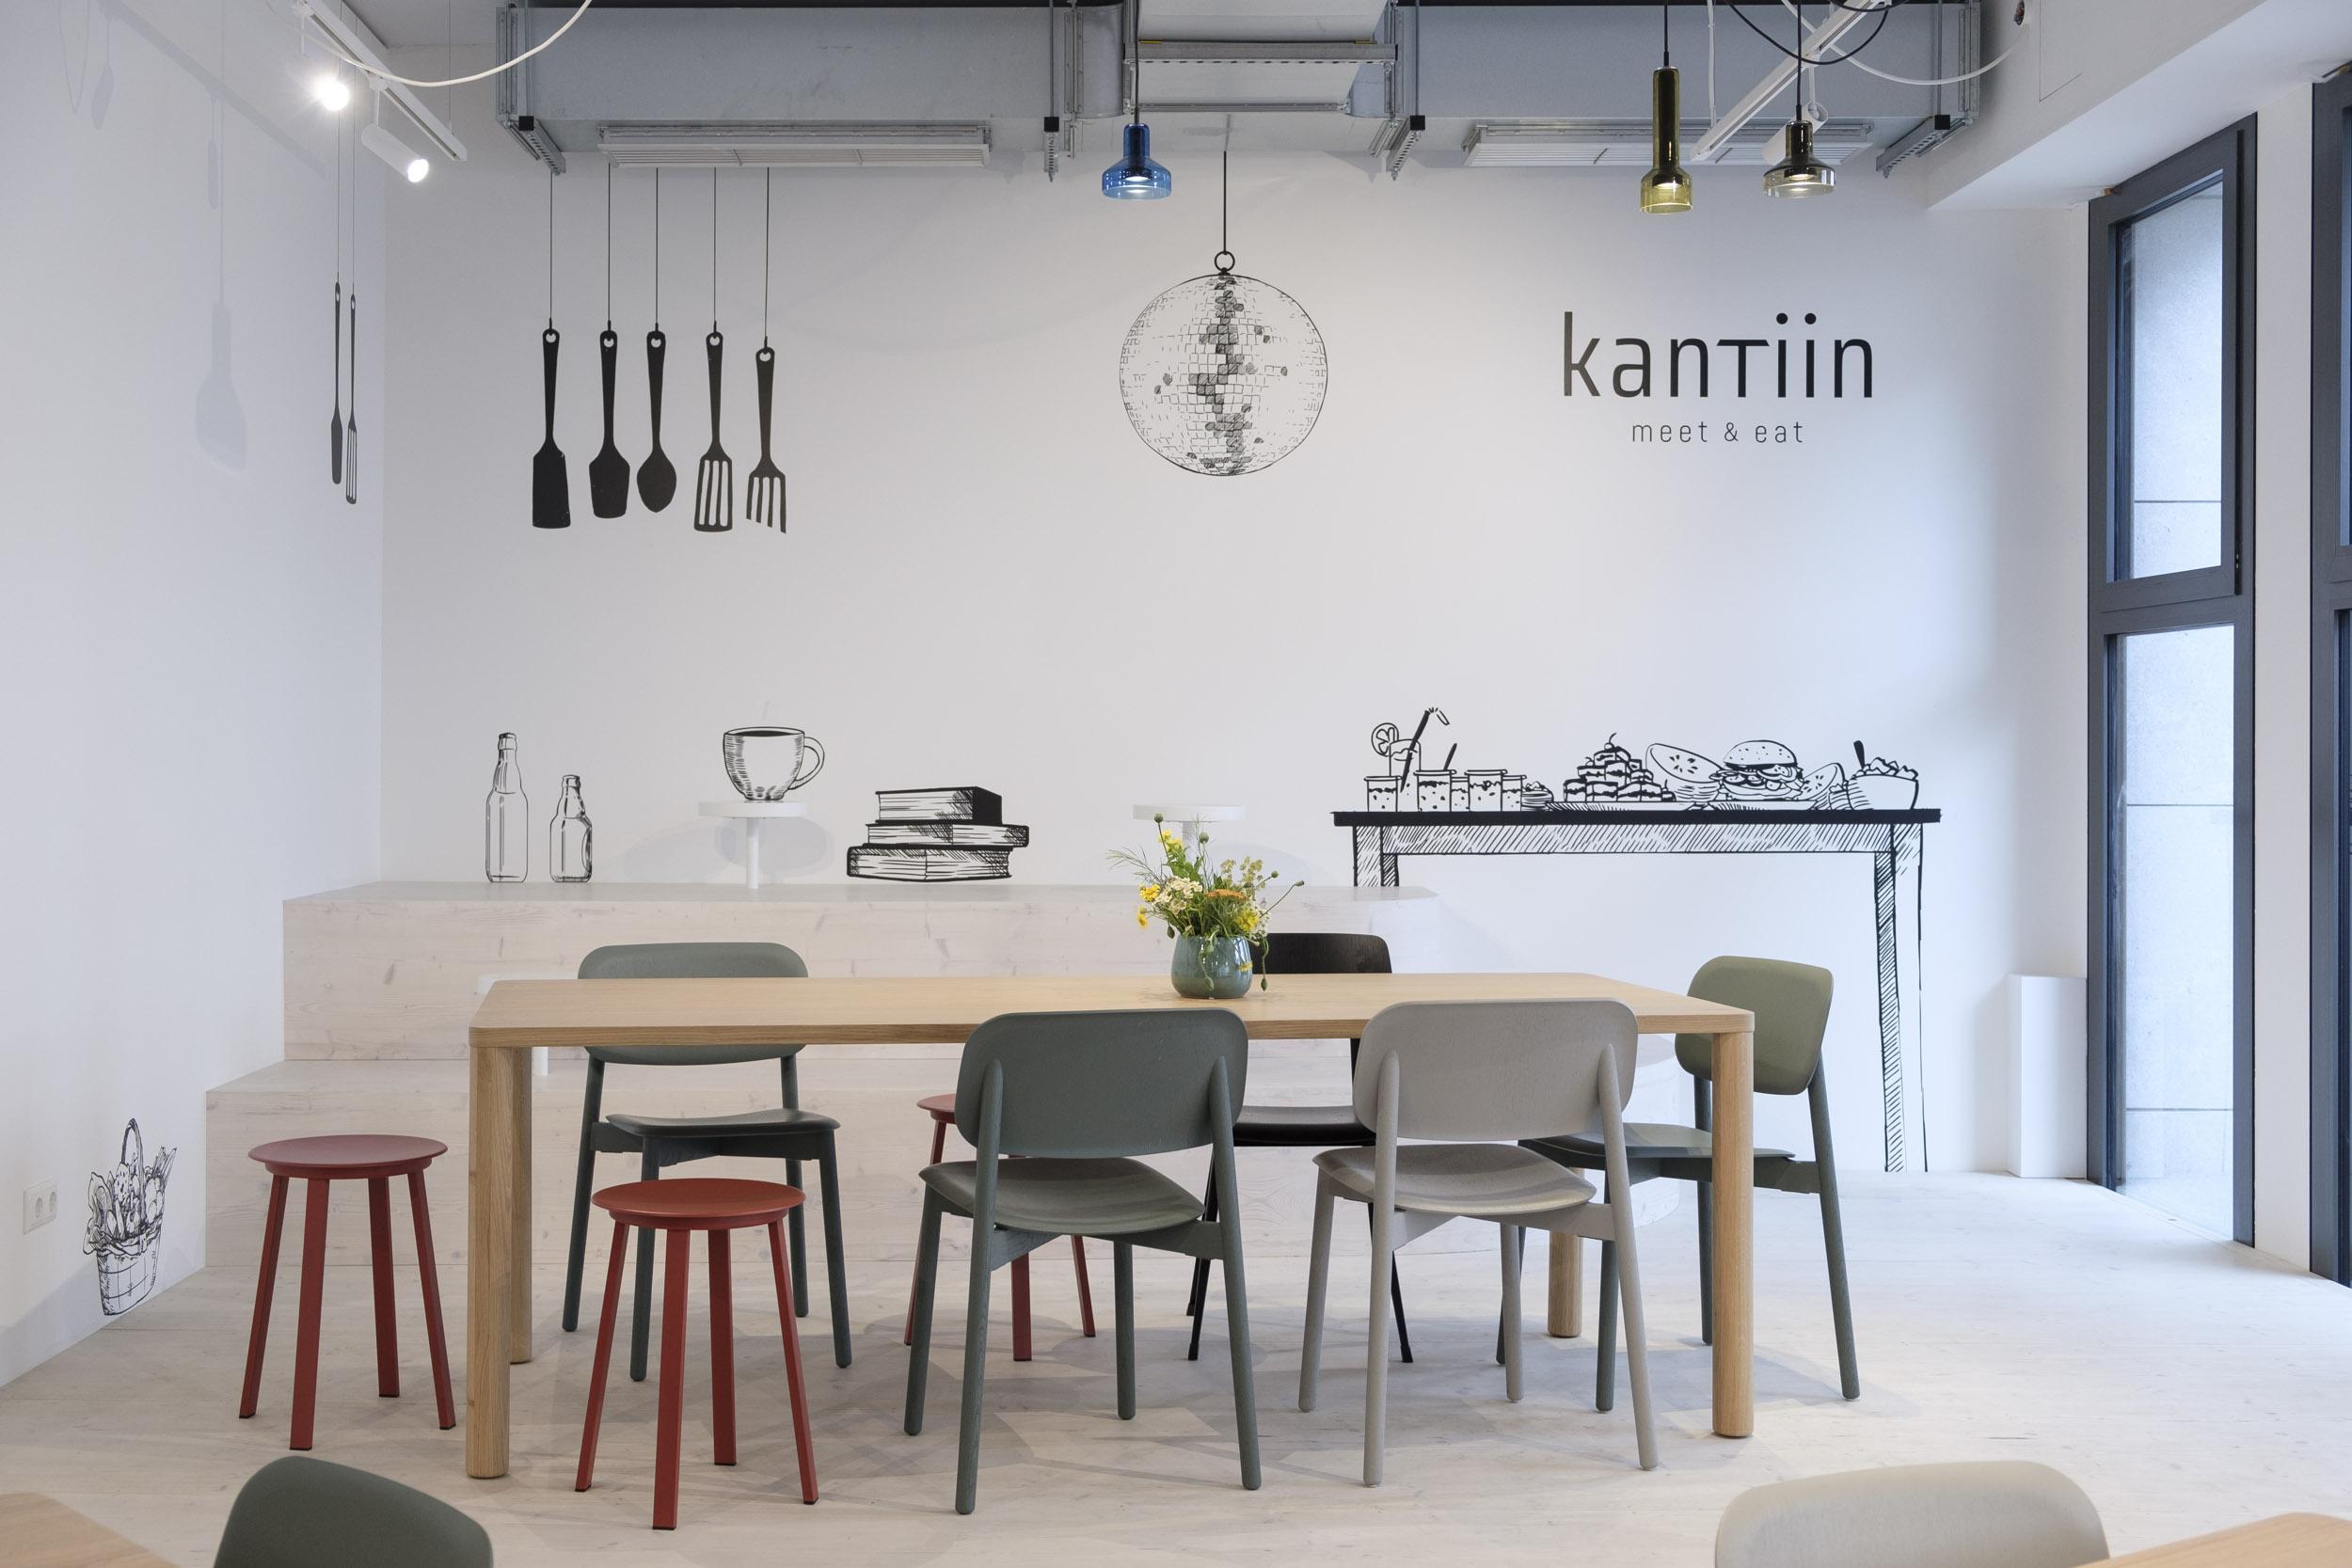 Kantiin-HS-Fresenius-2500px-72dpi-3510.jpg